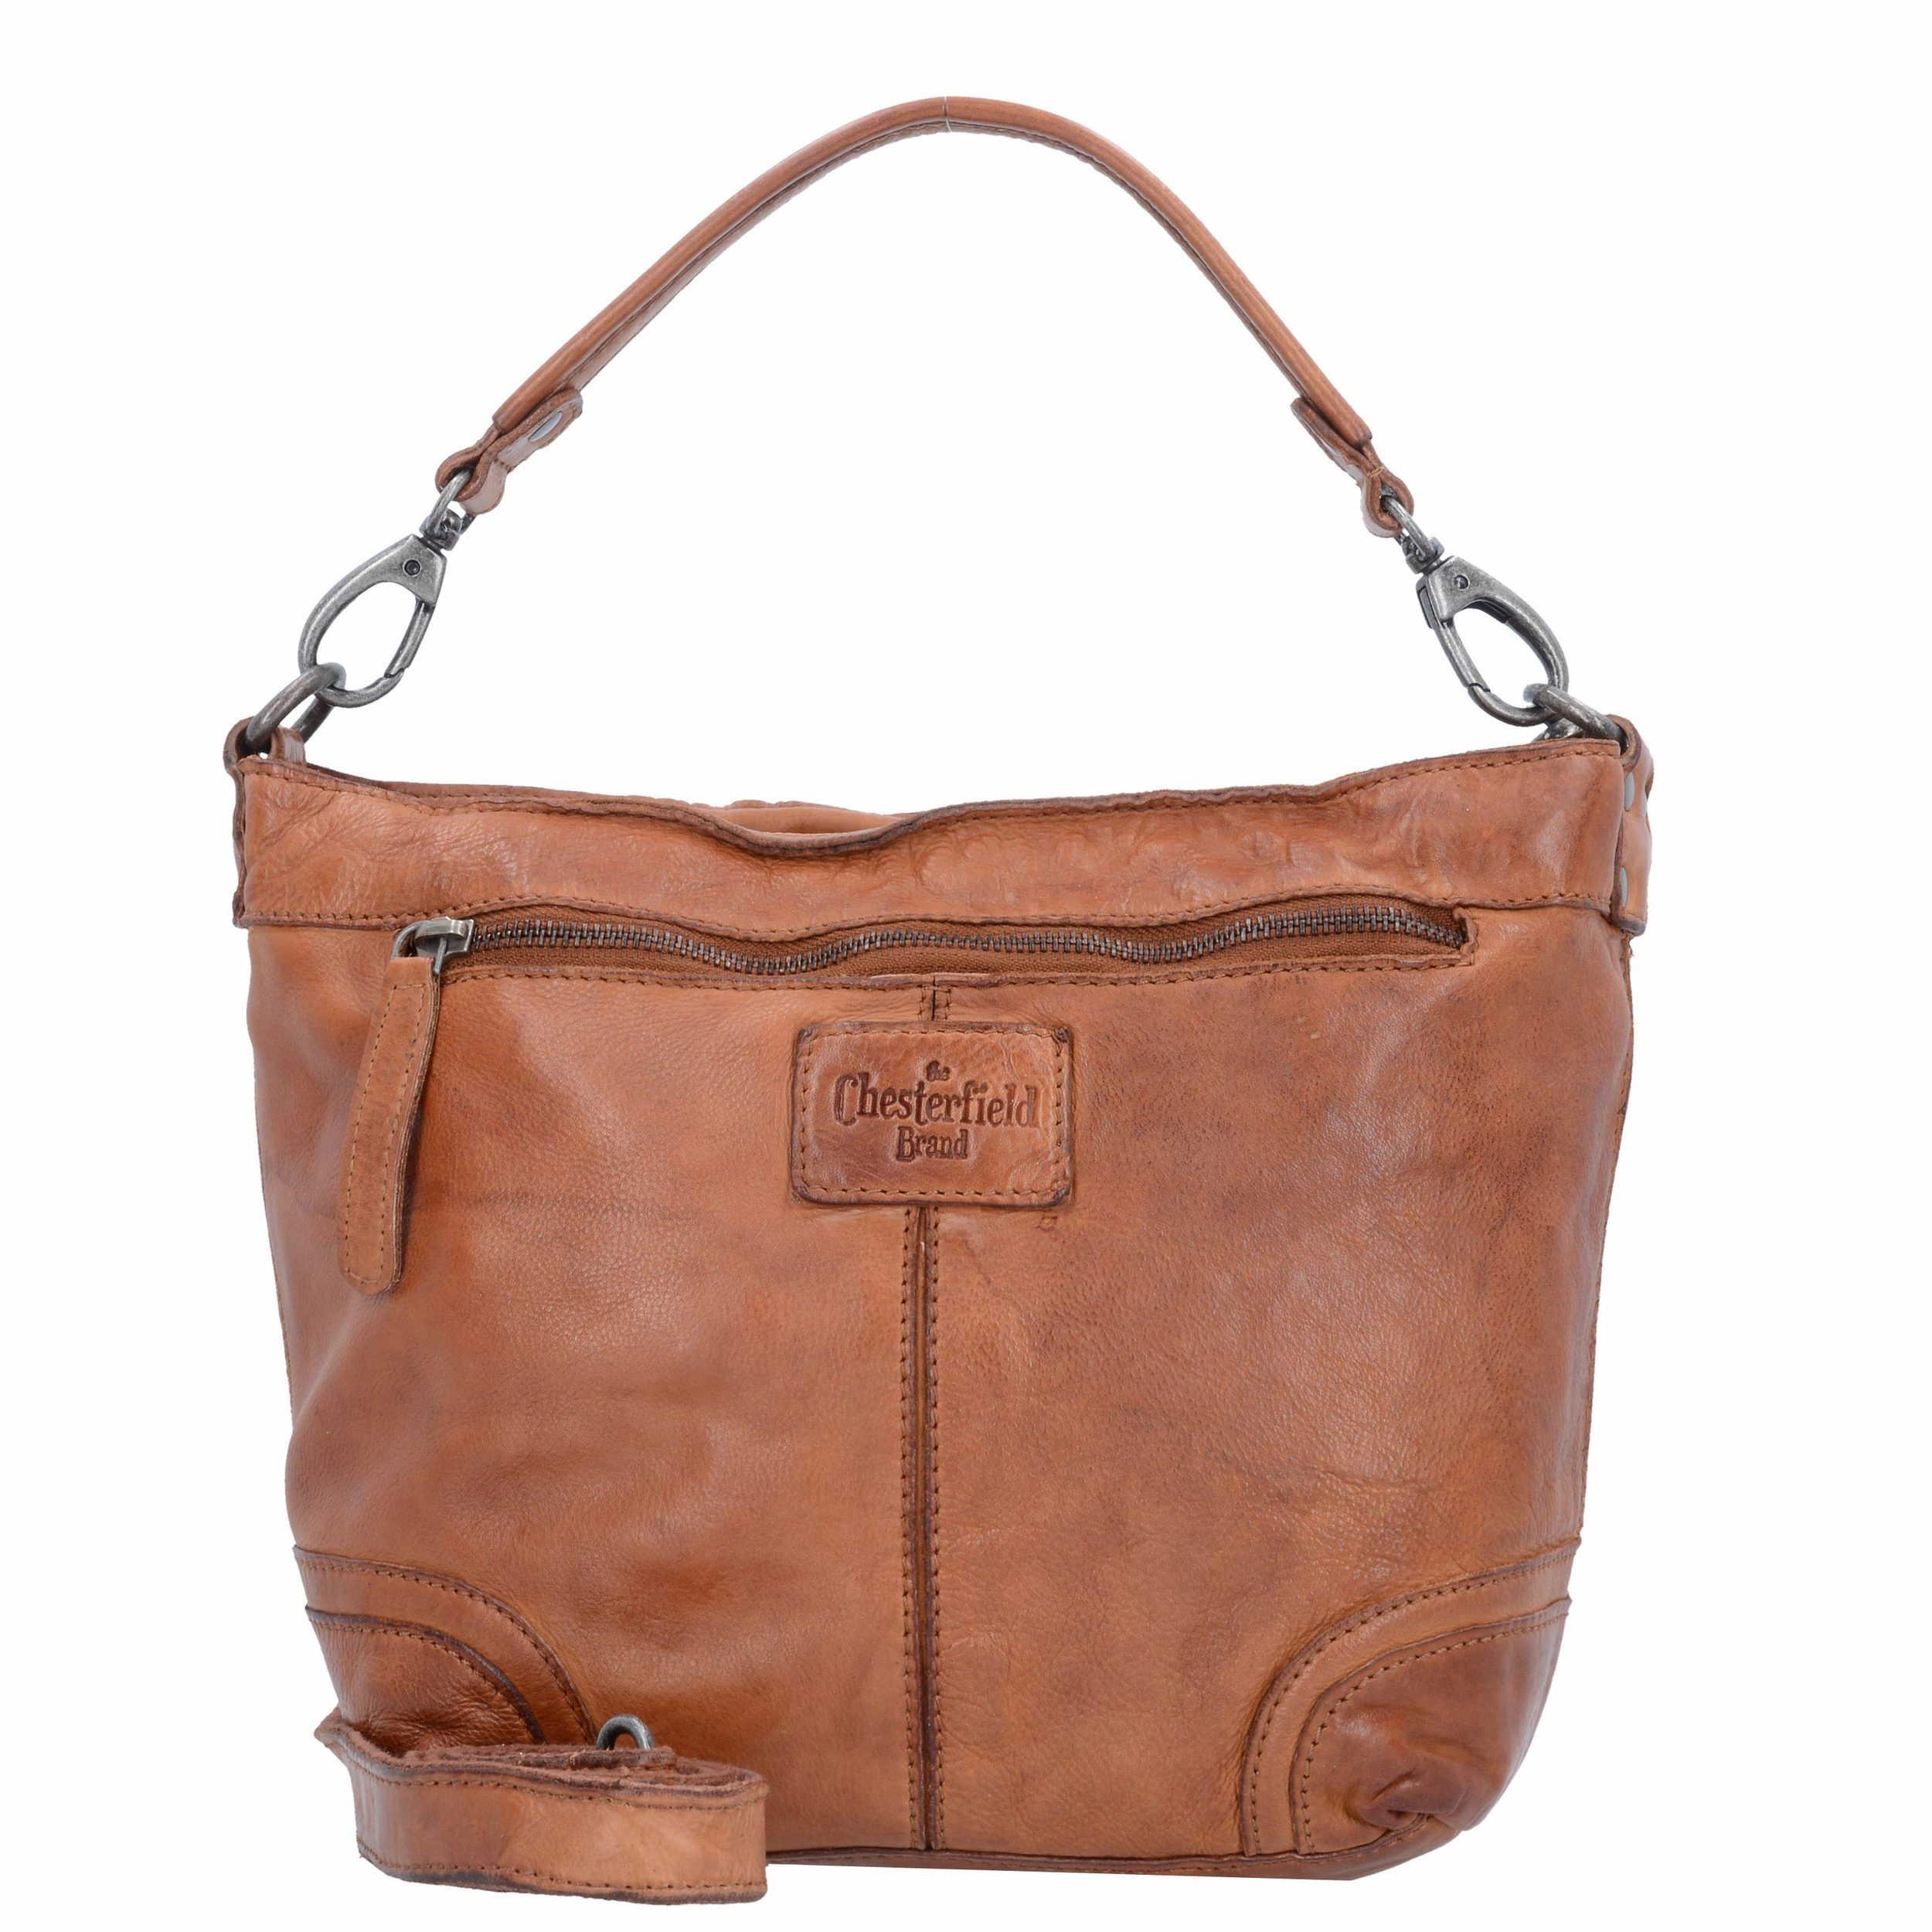 The Chesterfield Brand Handtaschen Taschen C48.0918_31 COGNAC Braun 5E5Gw